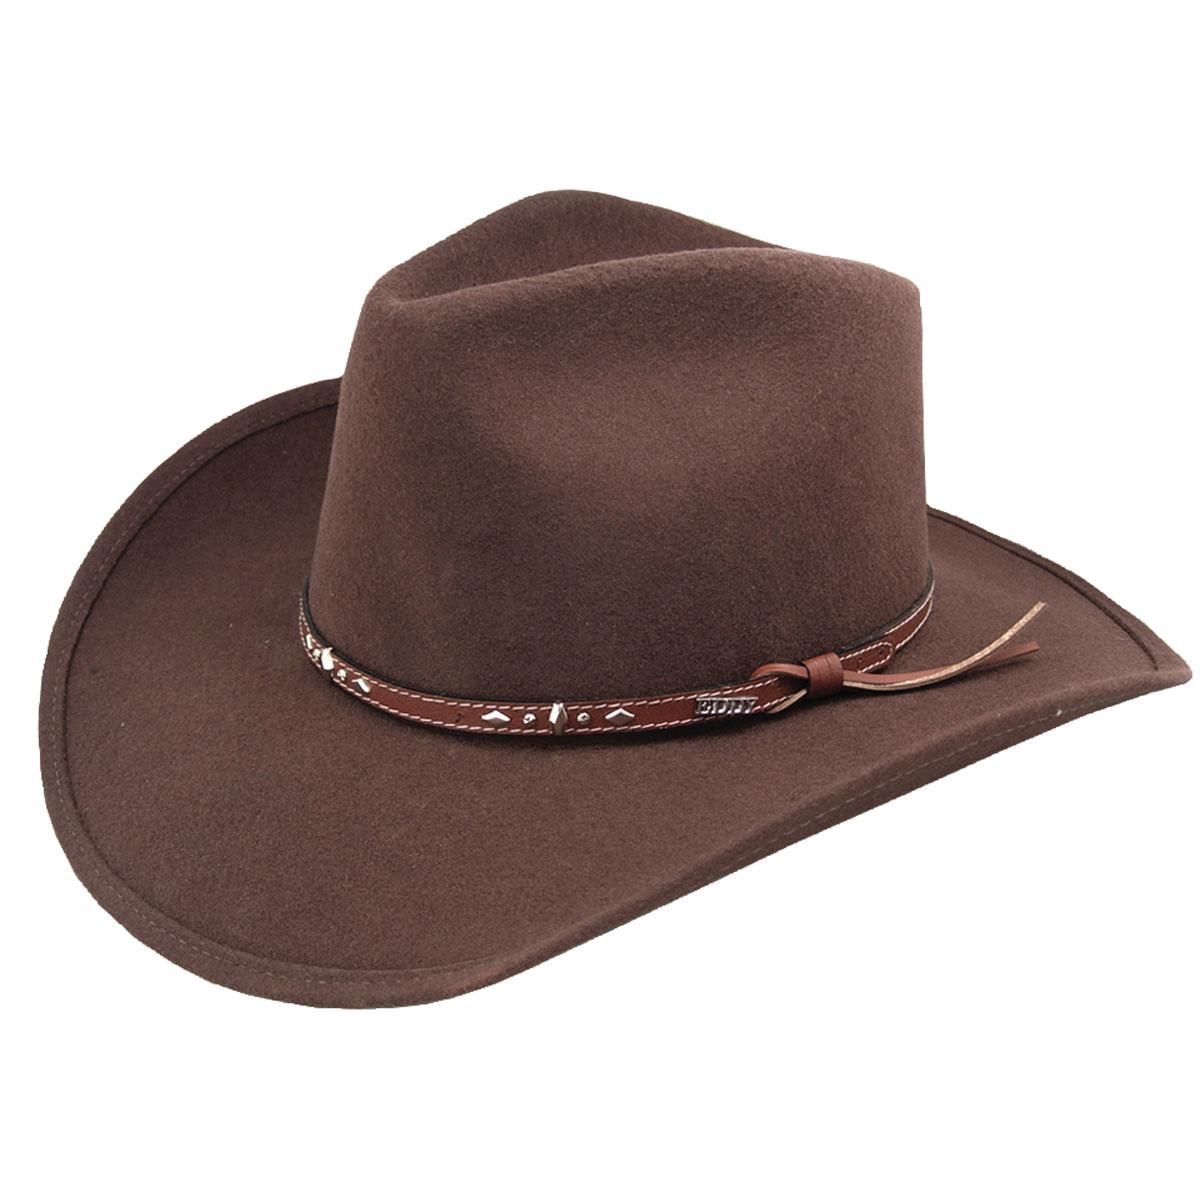 Eddy Bros. Buckhorn Western Hat in Pecan